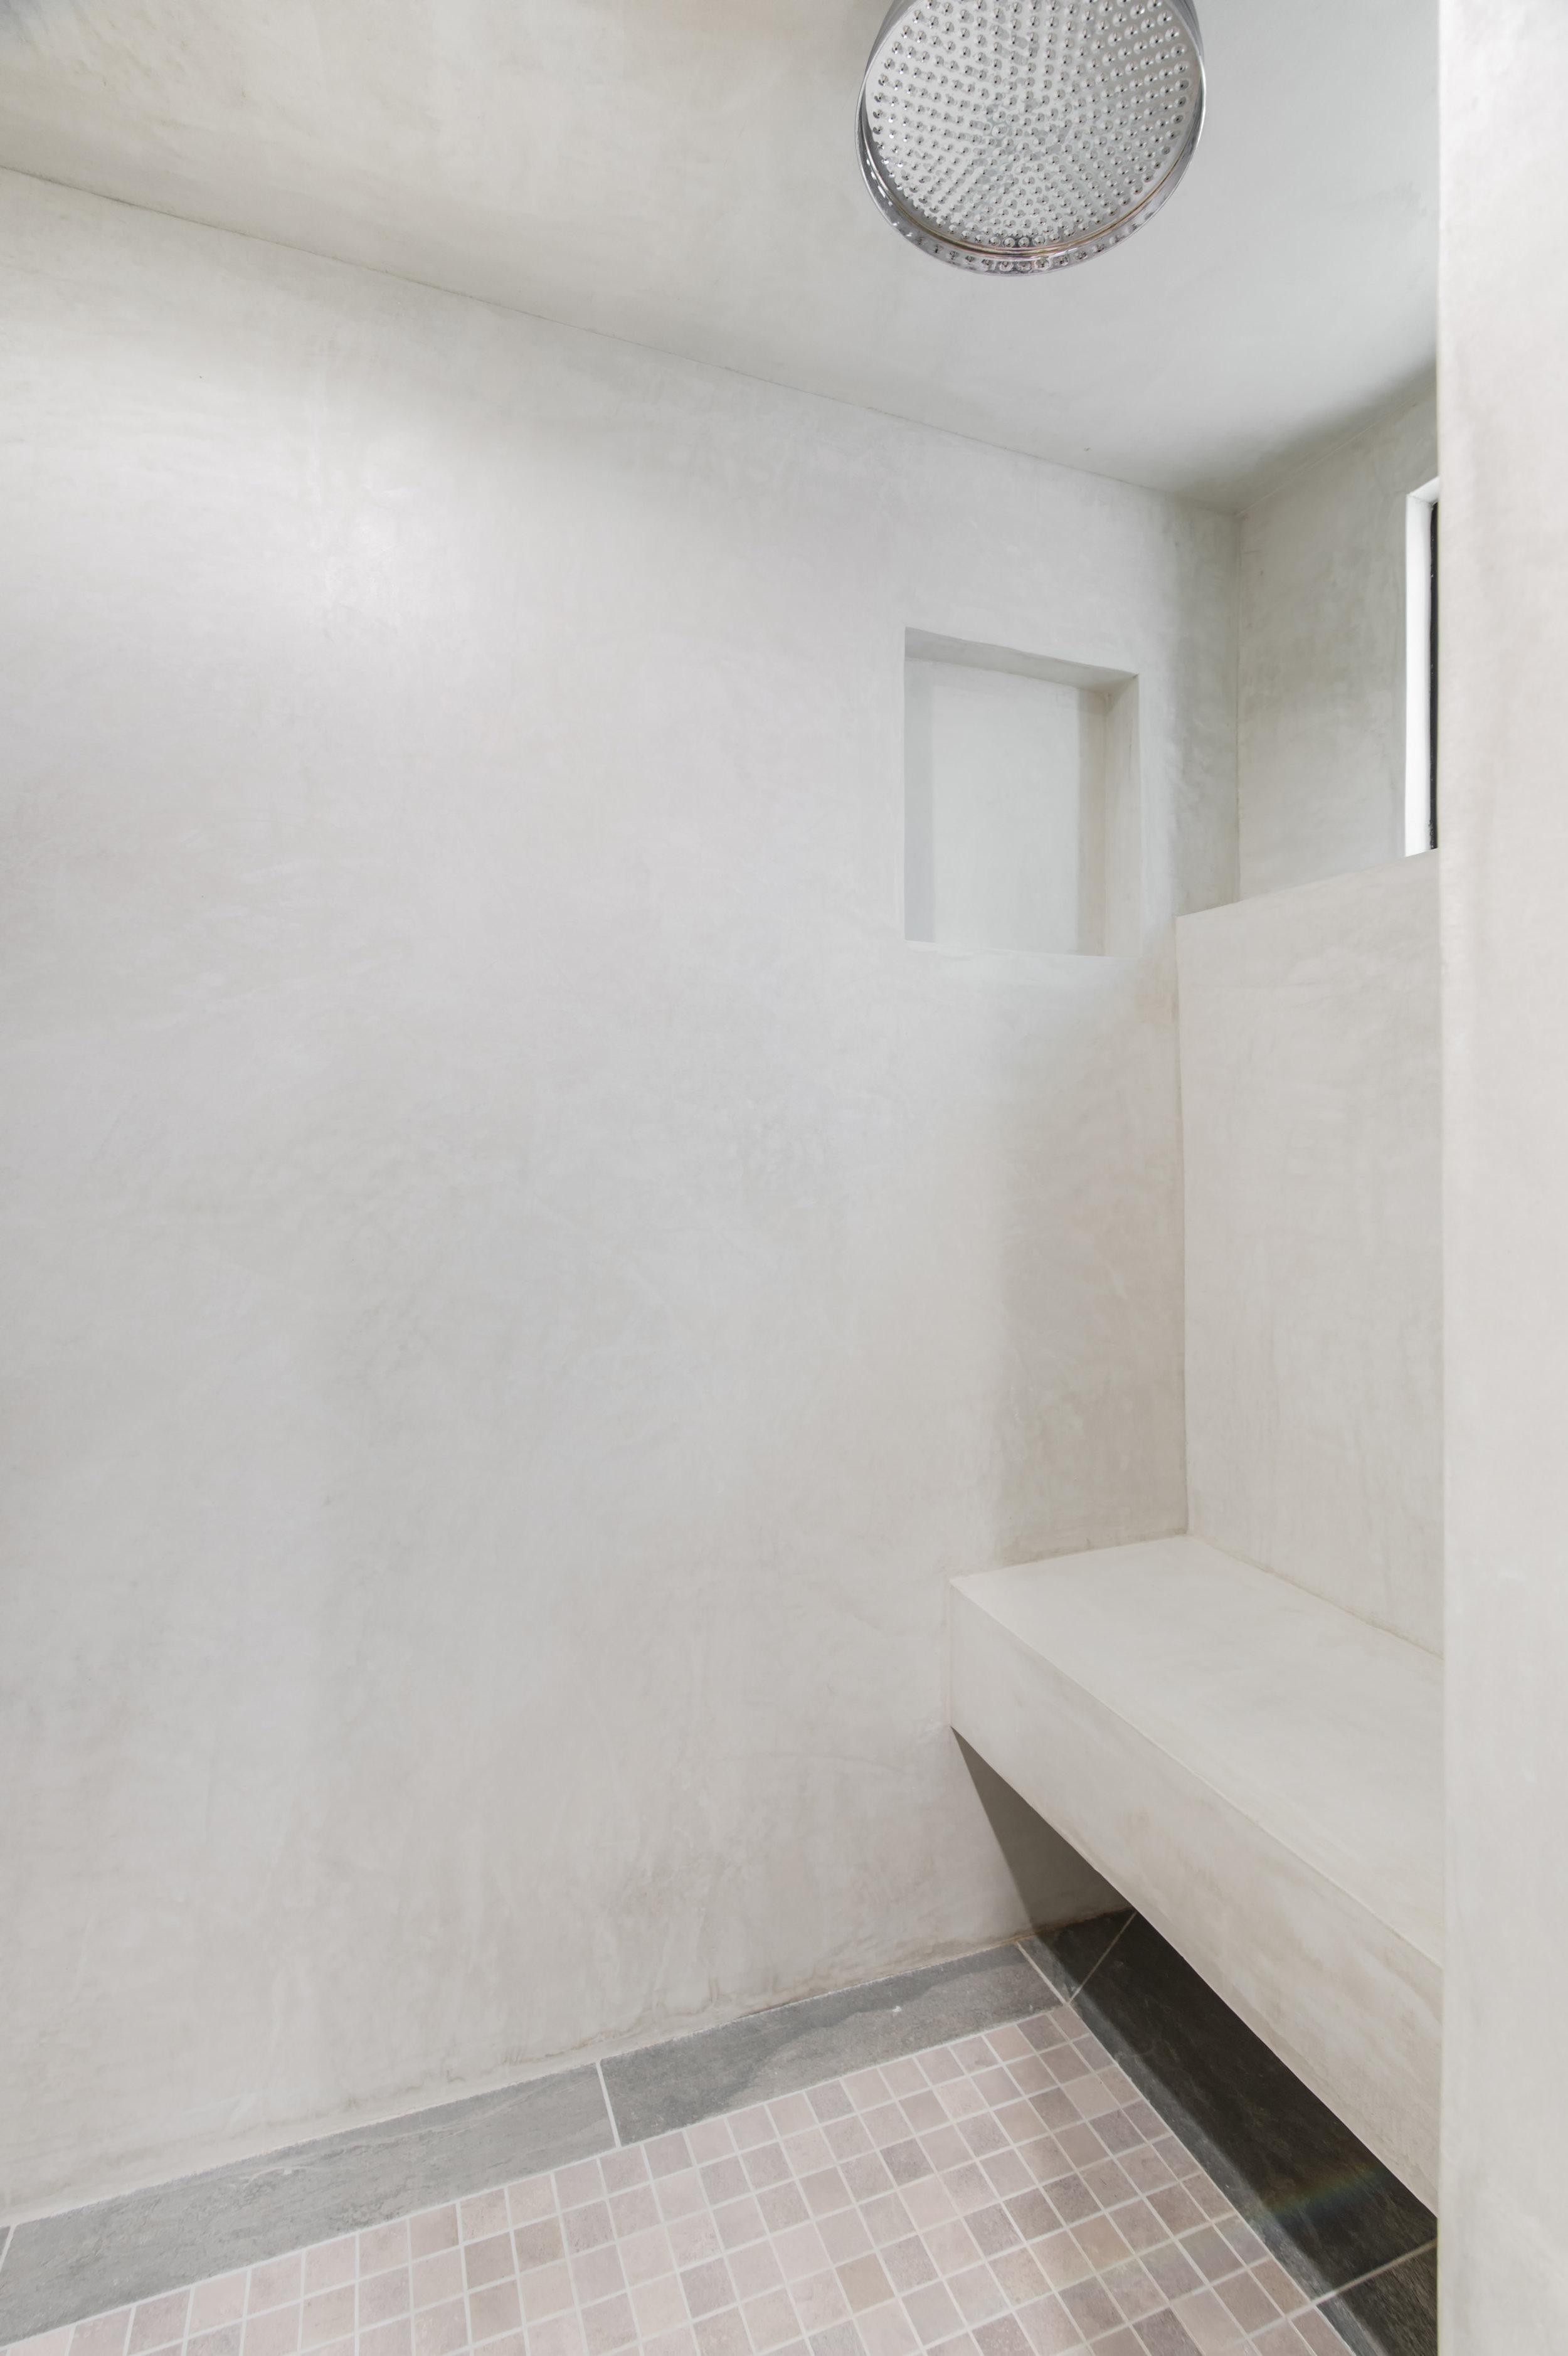 028 Bathroom 26272 Cool Glen Way Malibu For Sale Luxury Real Estate.jpg